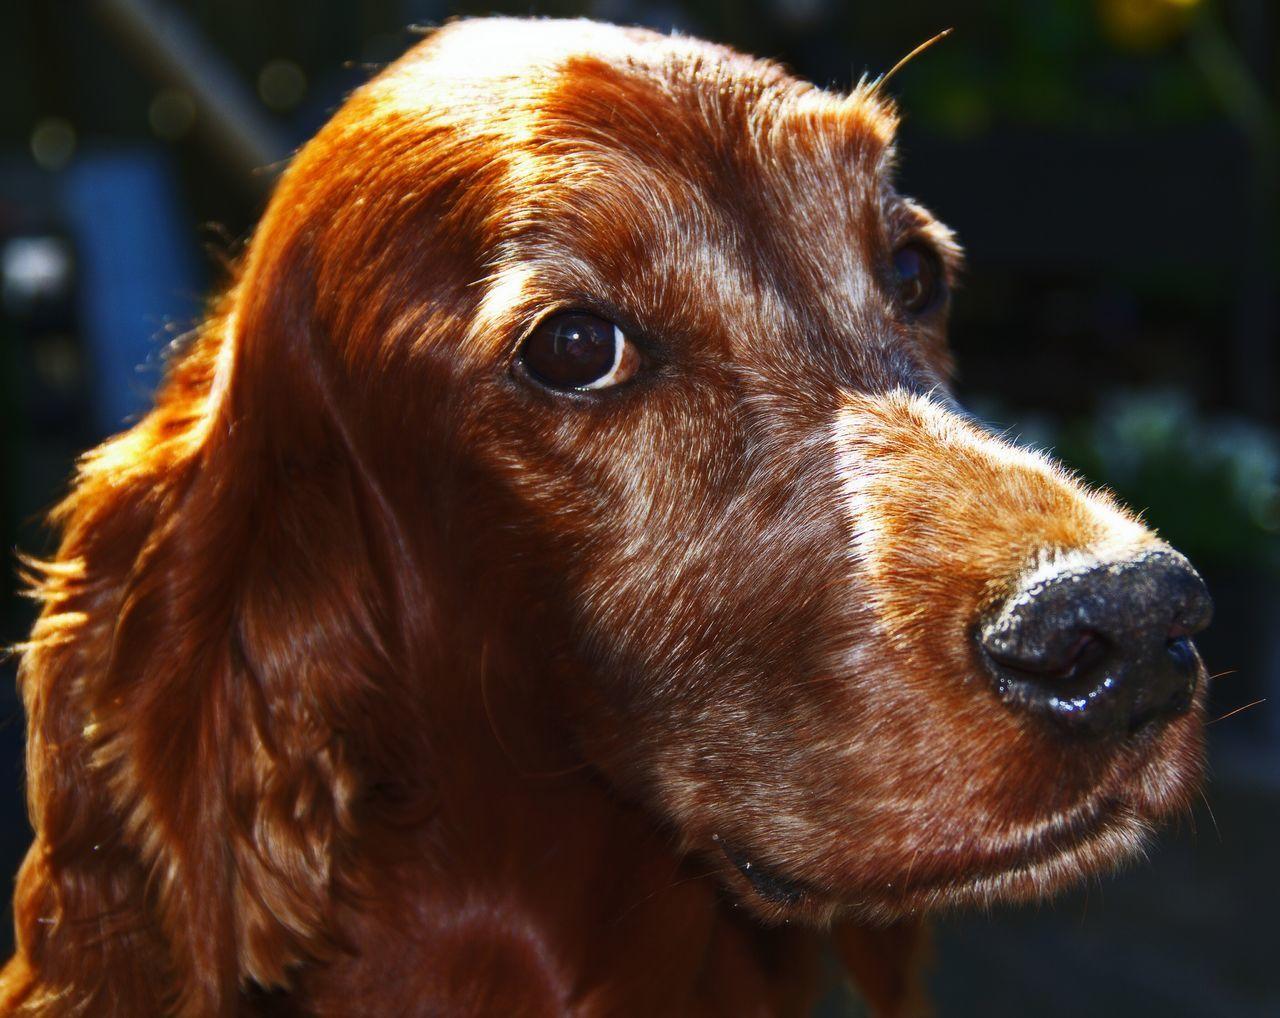 Close-Up Of Irish Setter Dog